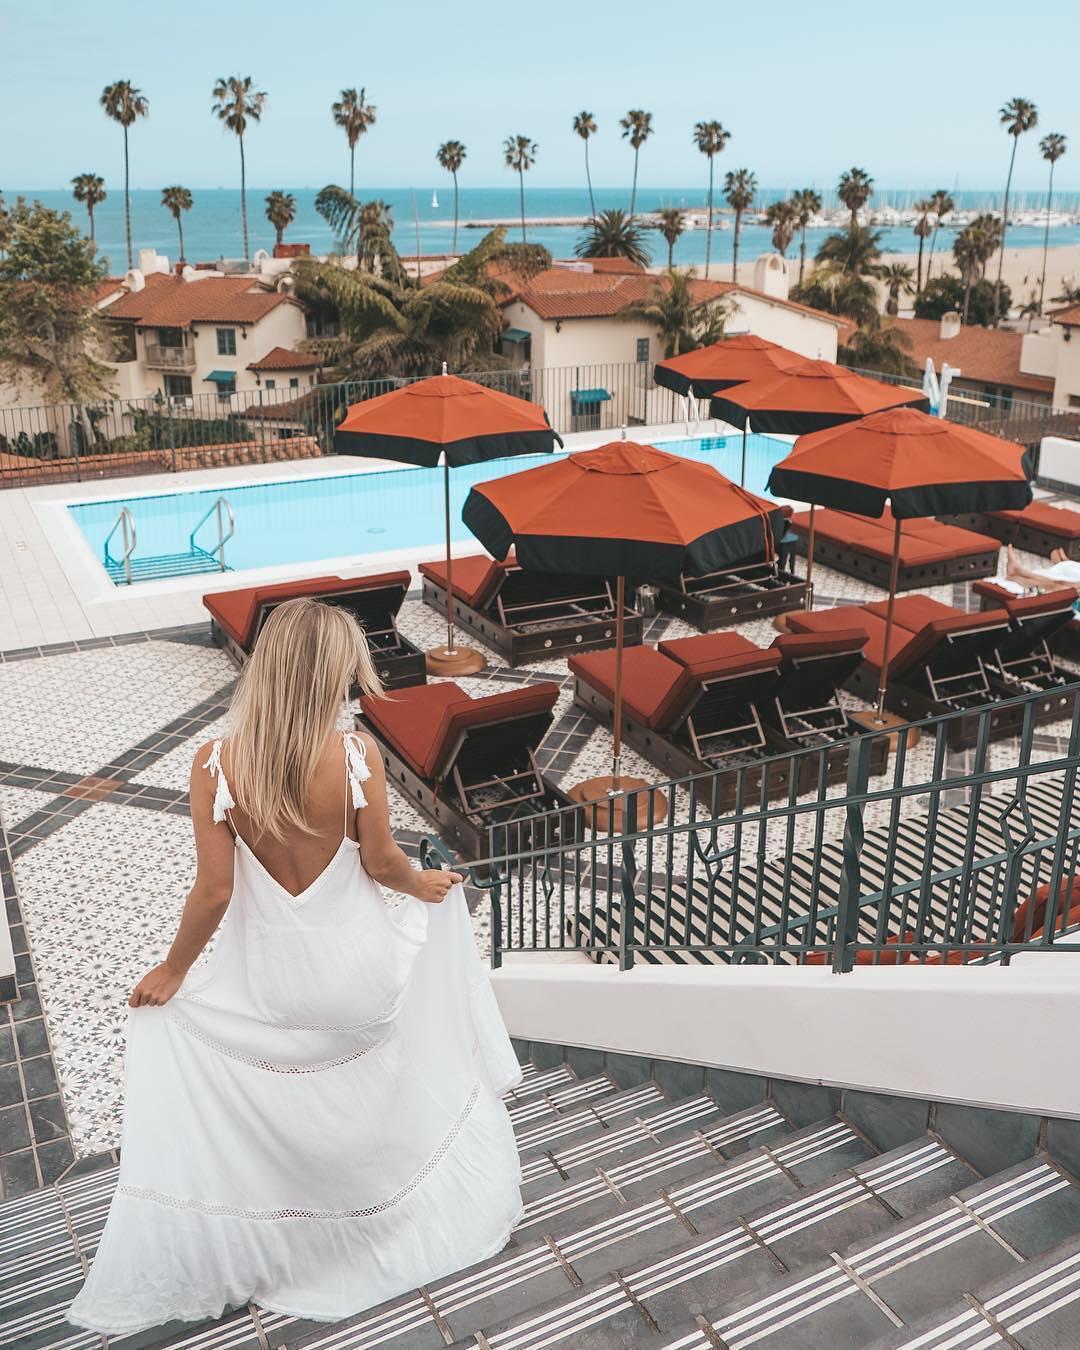 The Hotel Californian Santa Barbara Pool